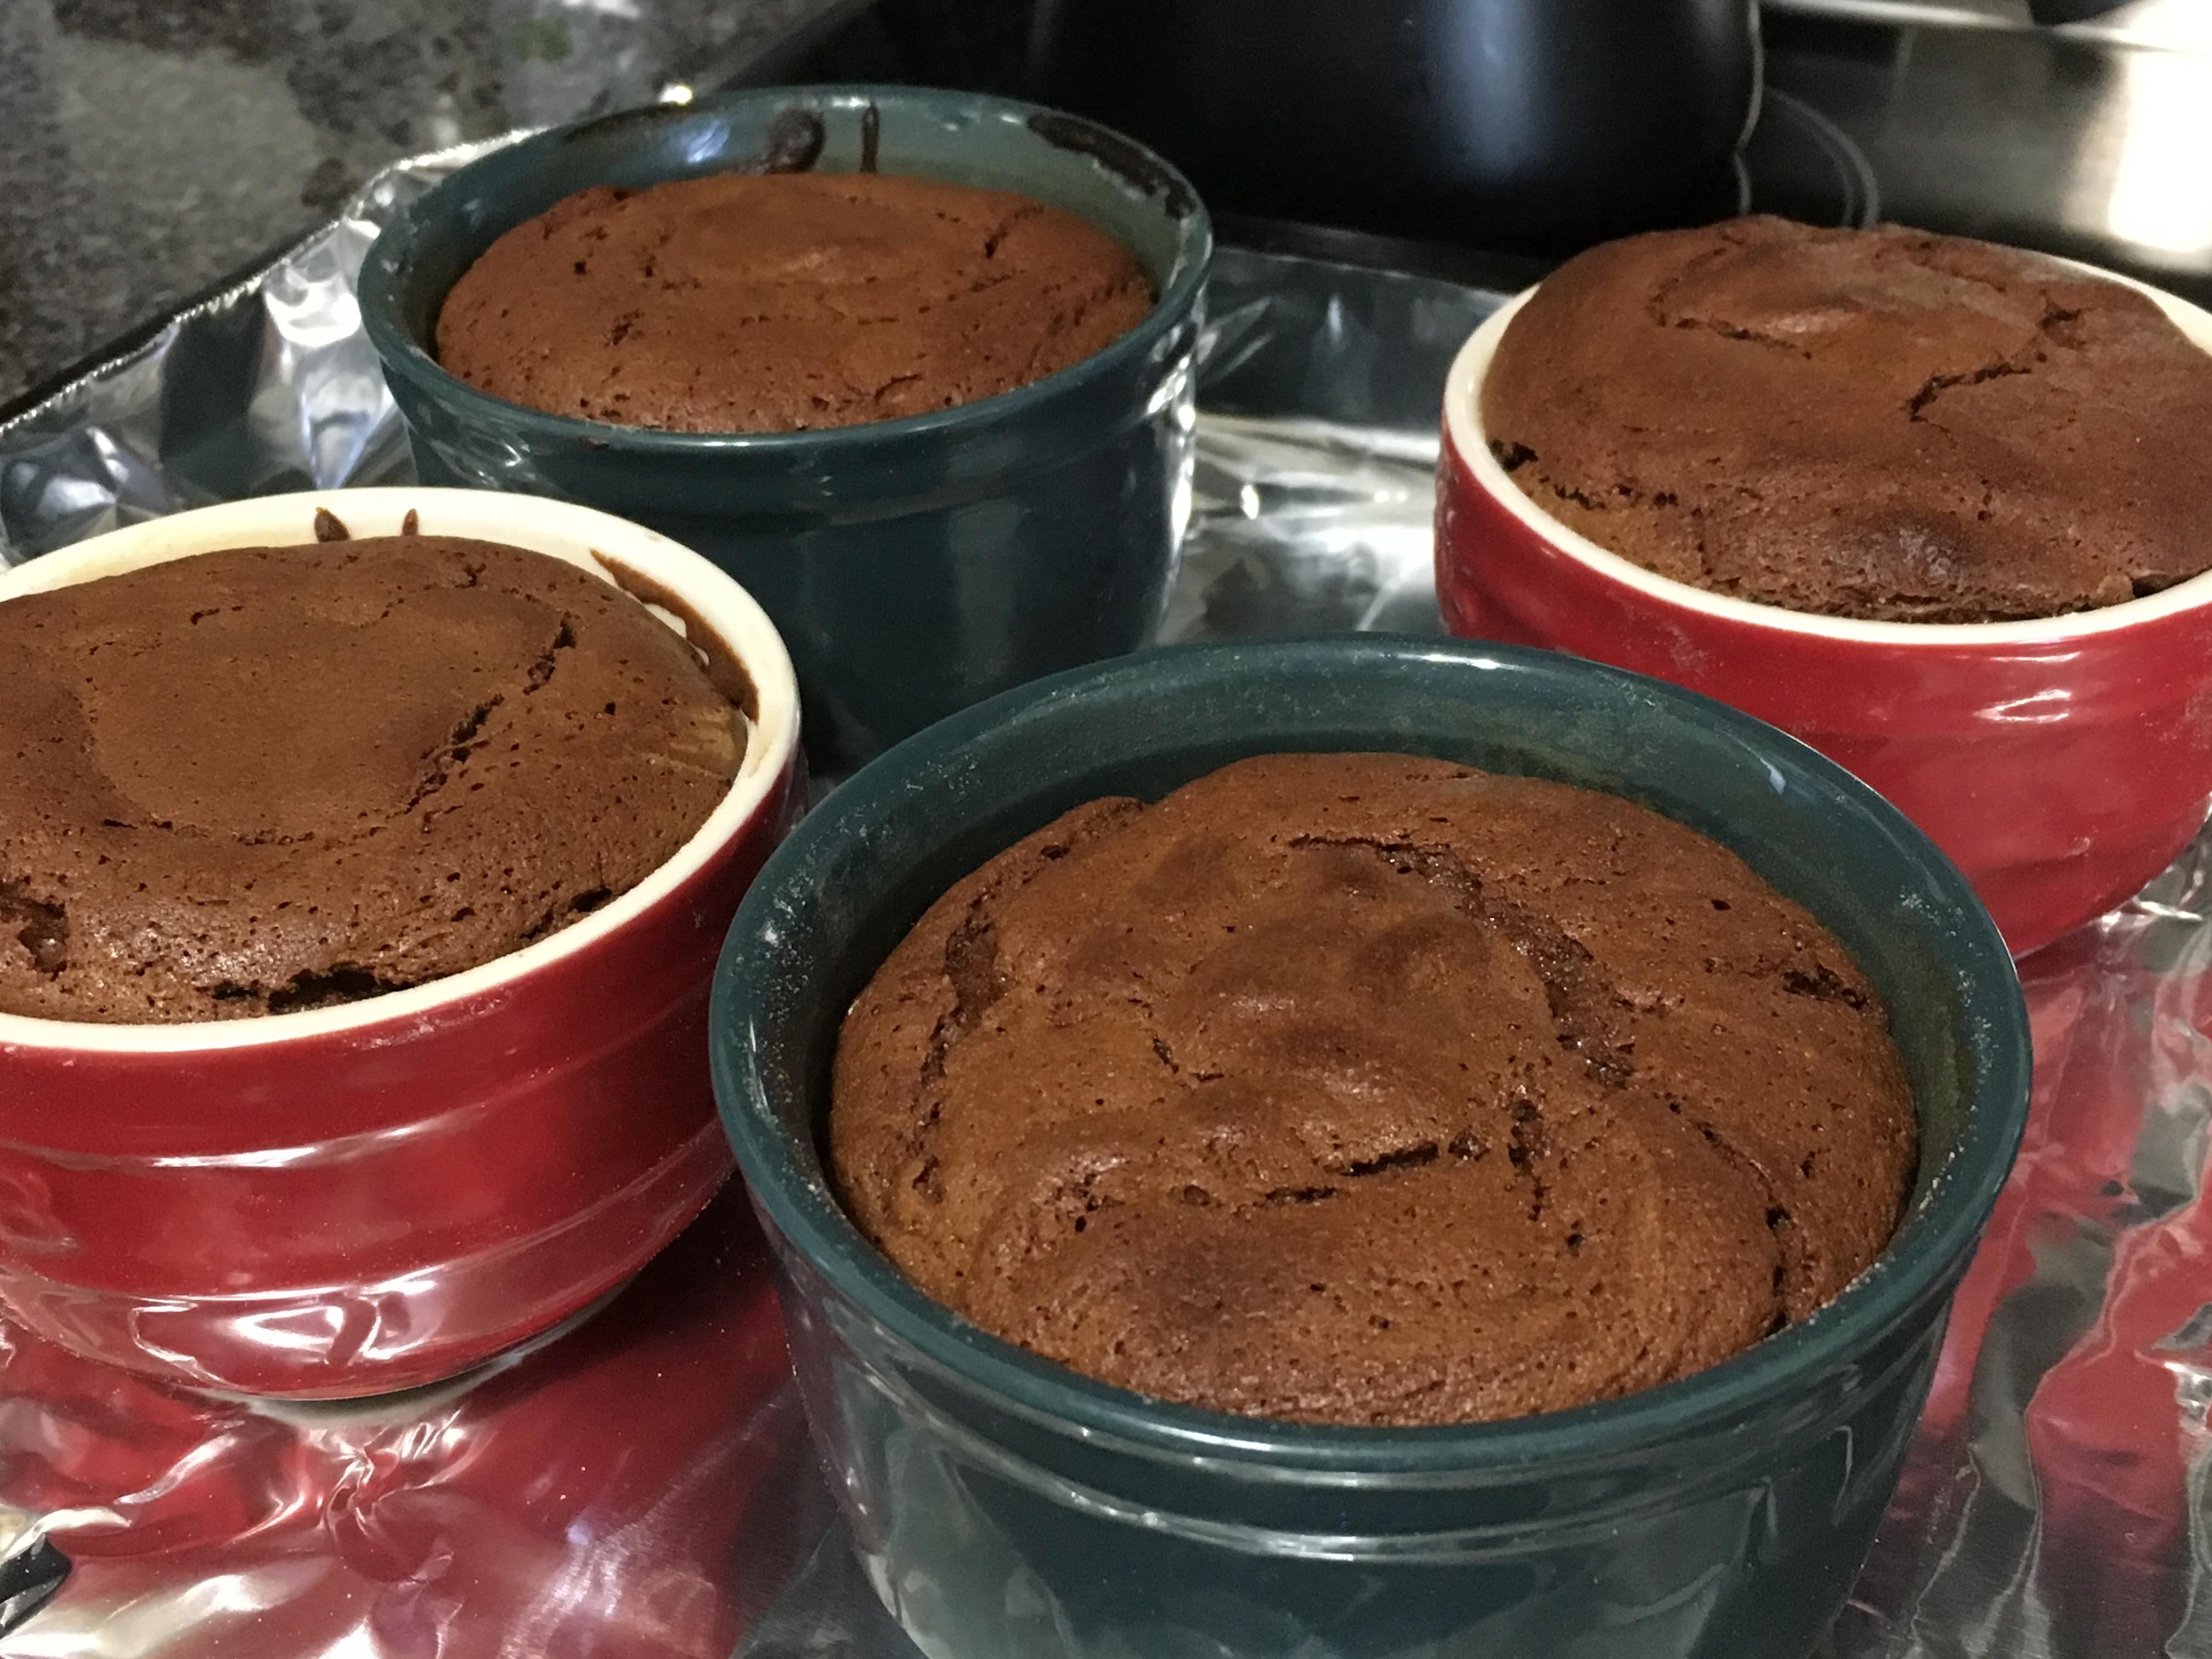 Chocolate molten lava cakes